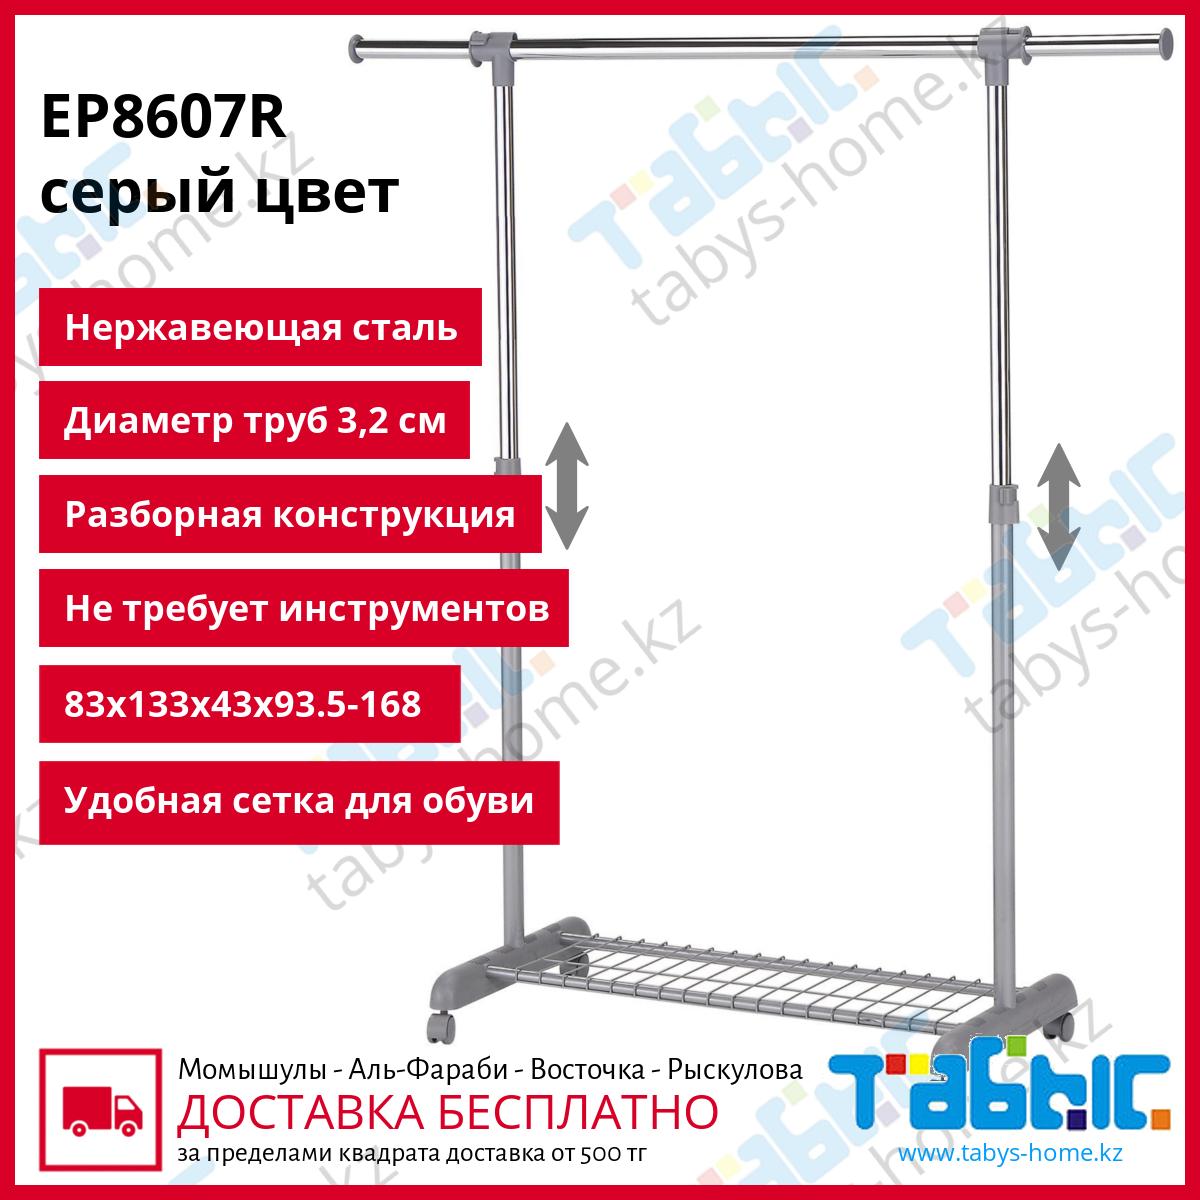 Вешалка для одежды гардеробная Табыс EP 8607R (серый цвет)